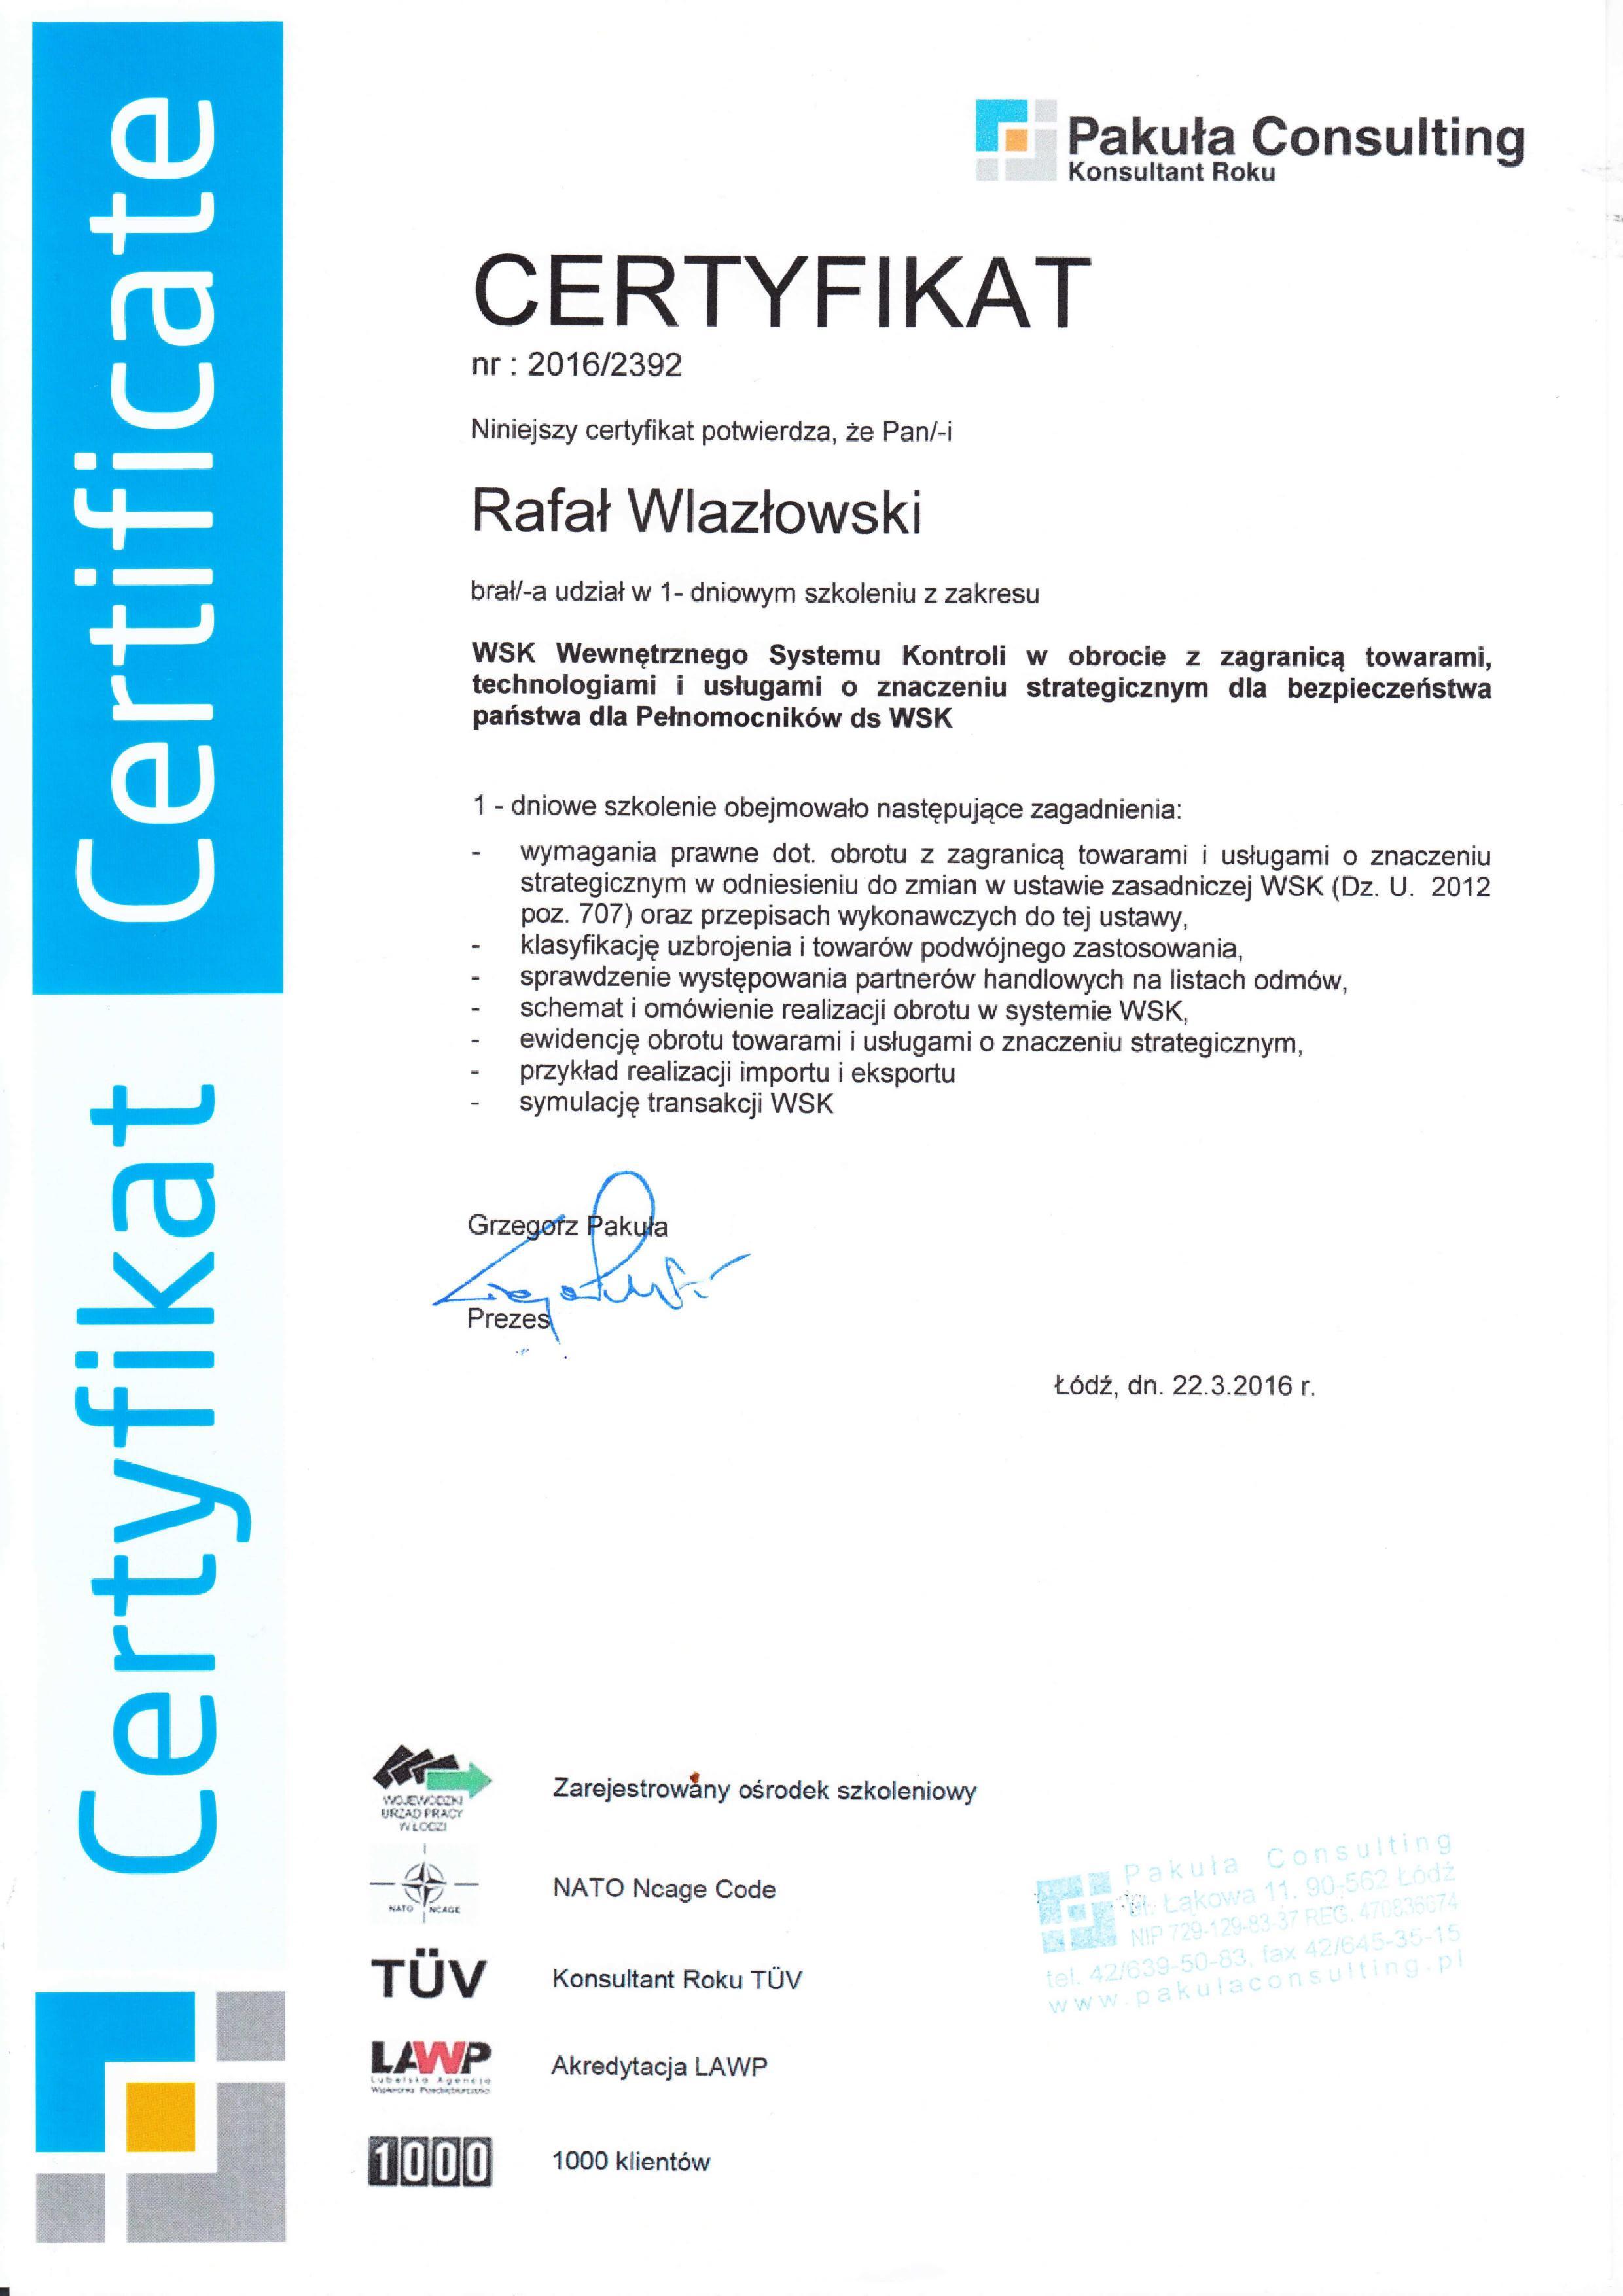 Certyfikat Pakuła Consulting